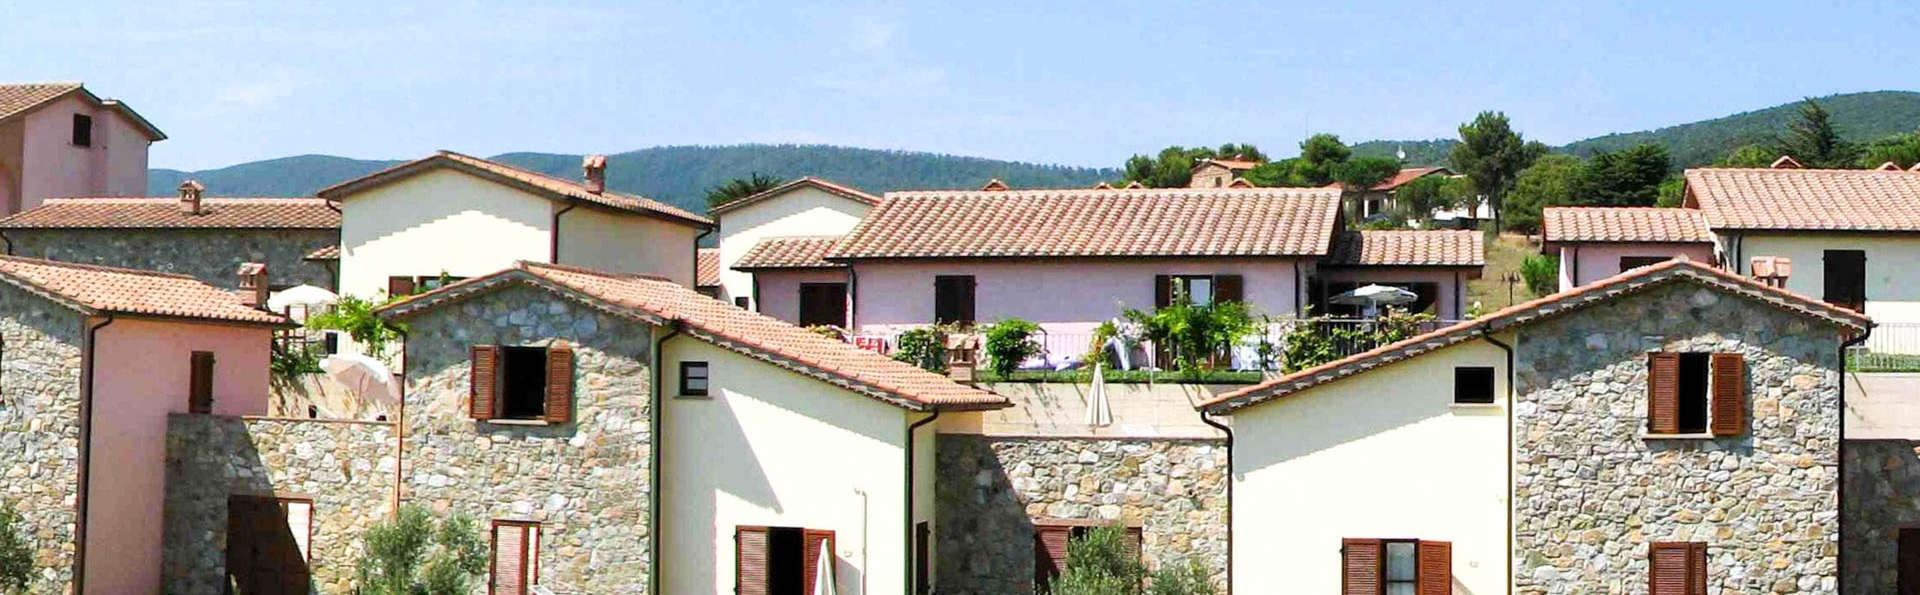 Borgo San Pecoraio - EDIT_VIEW3.jpg